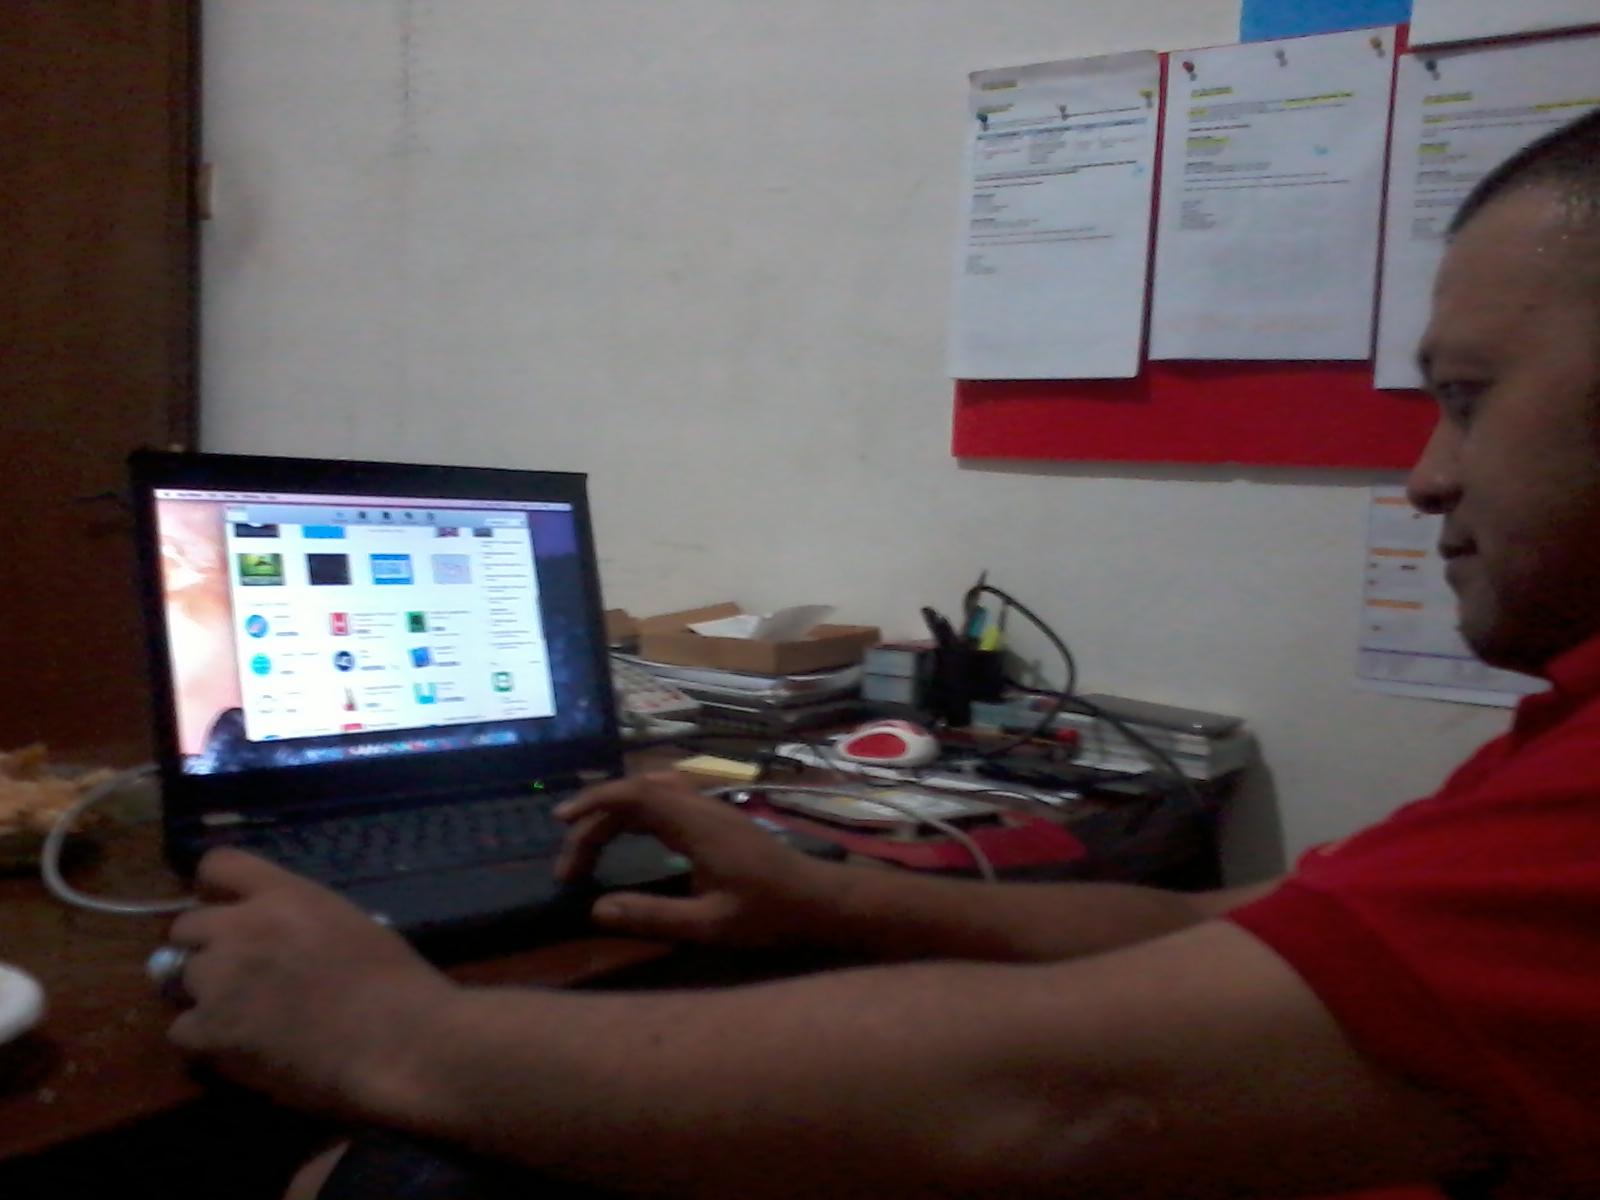 Install Hackintosh Thinkpad T420 Dualboot MacOS Sierra